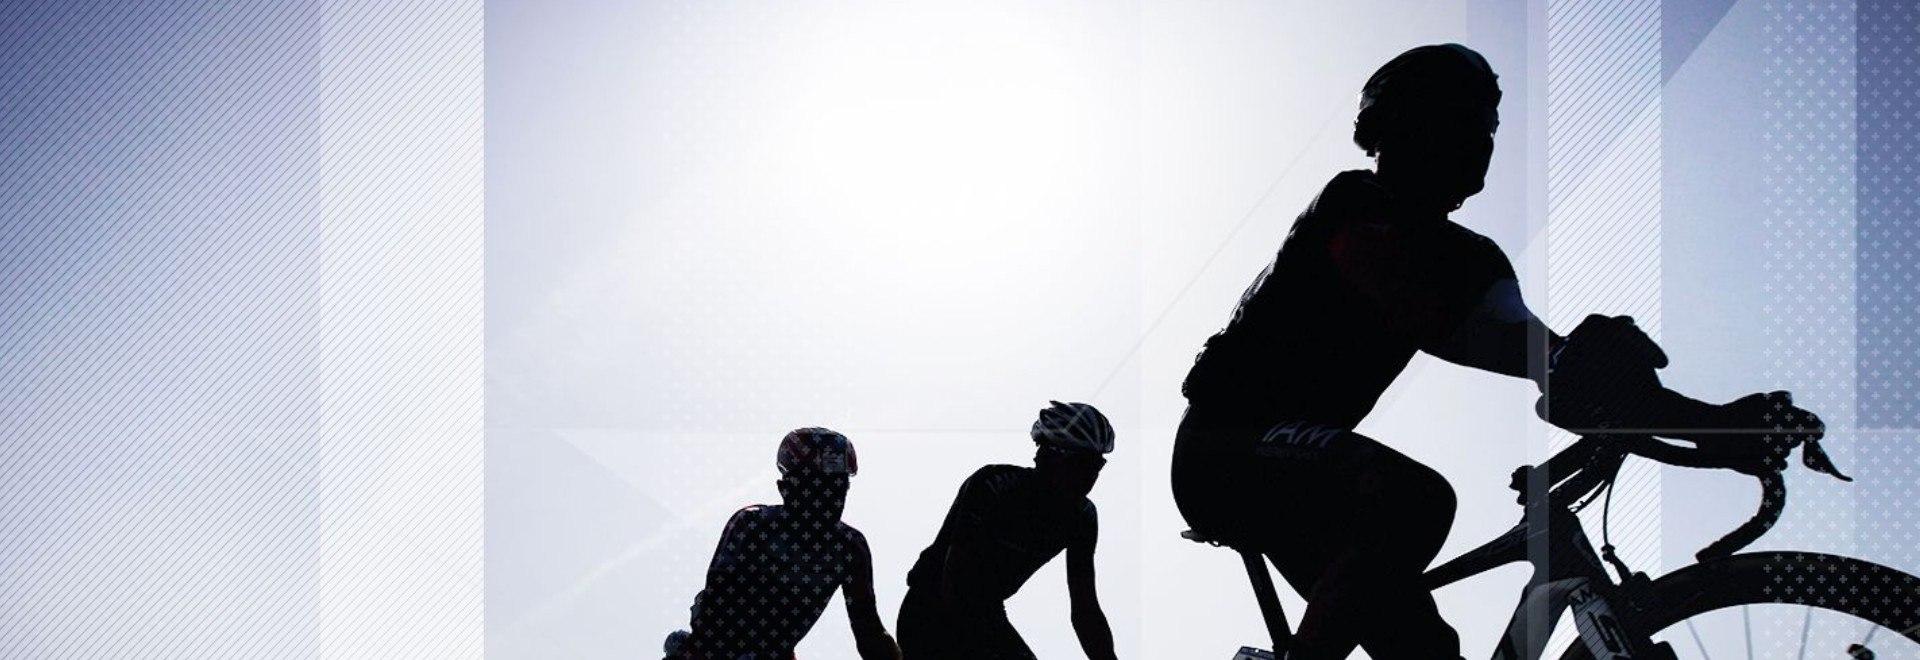 2a tappa. Perros Guirec - Mur de Bretagne (182 km)